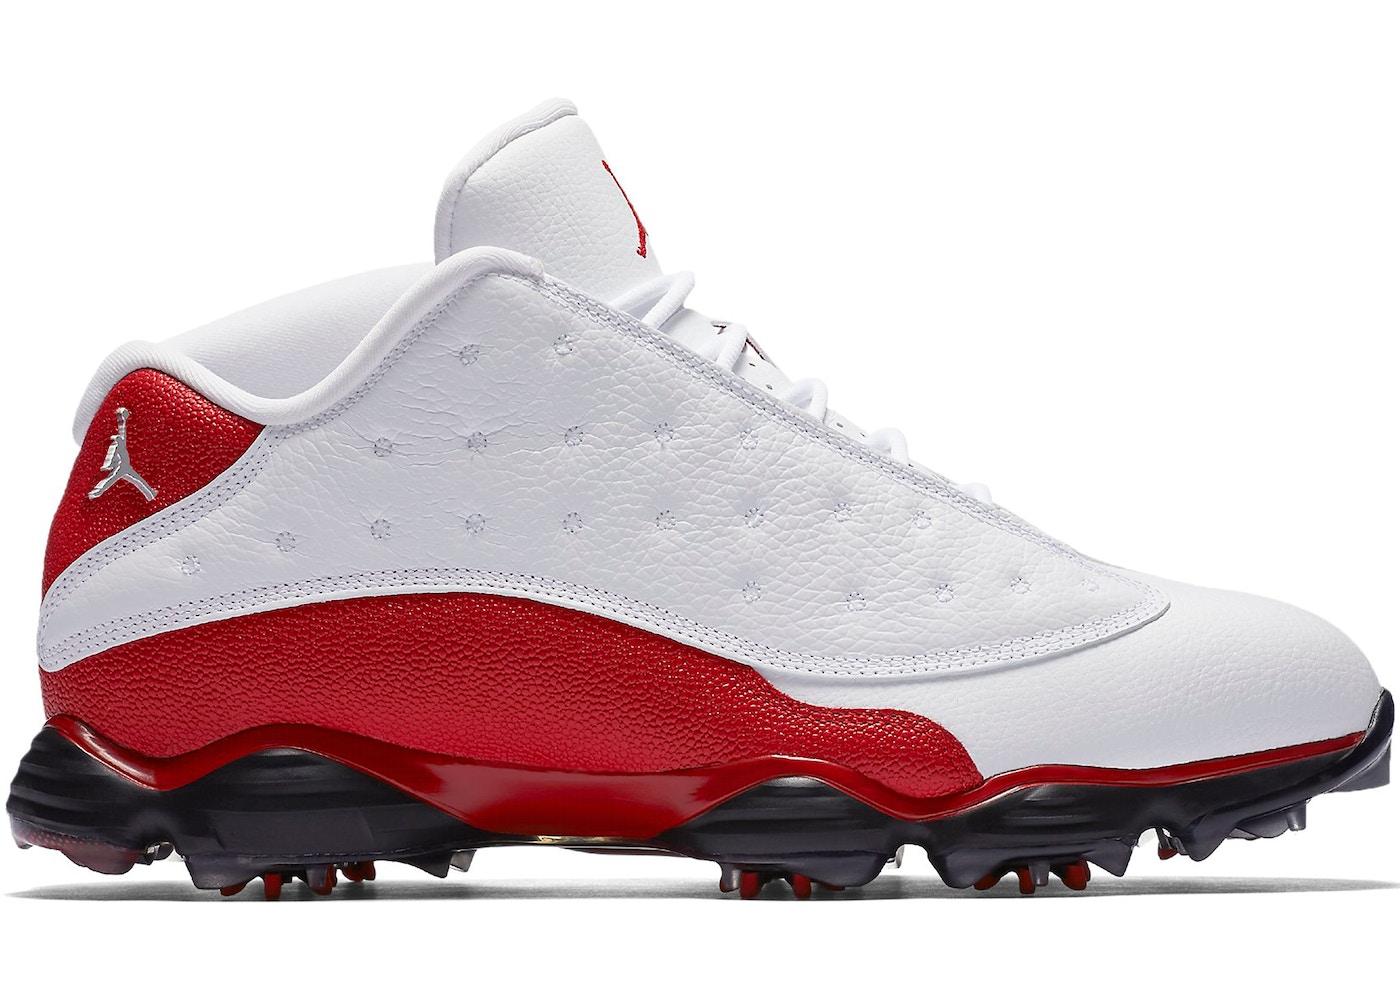 6032f6147a43 Jordan 13 Retro Golf Cleat White Red - 917719-101